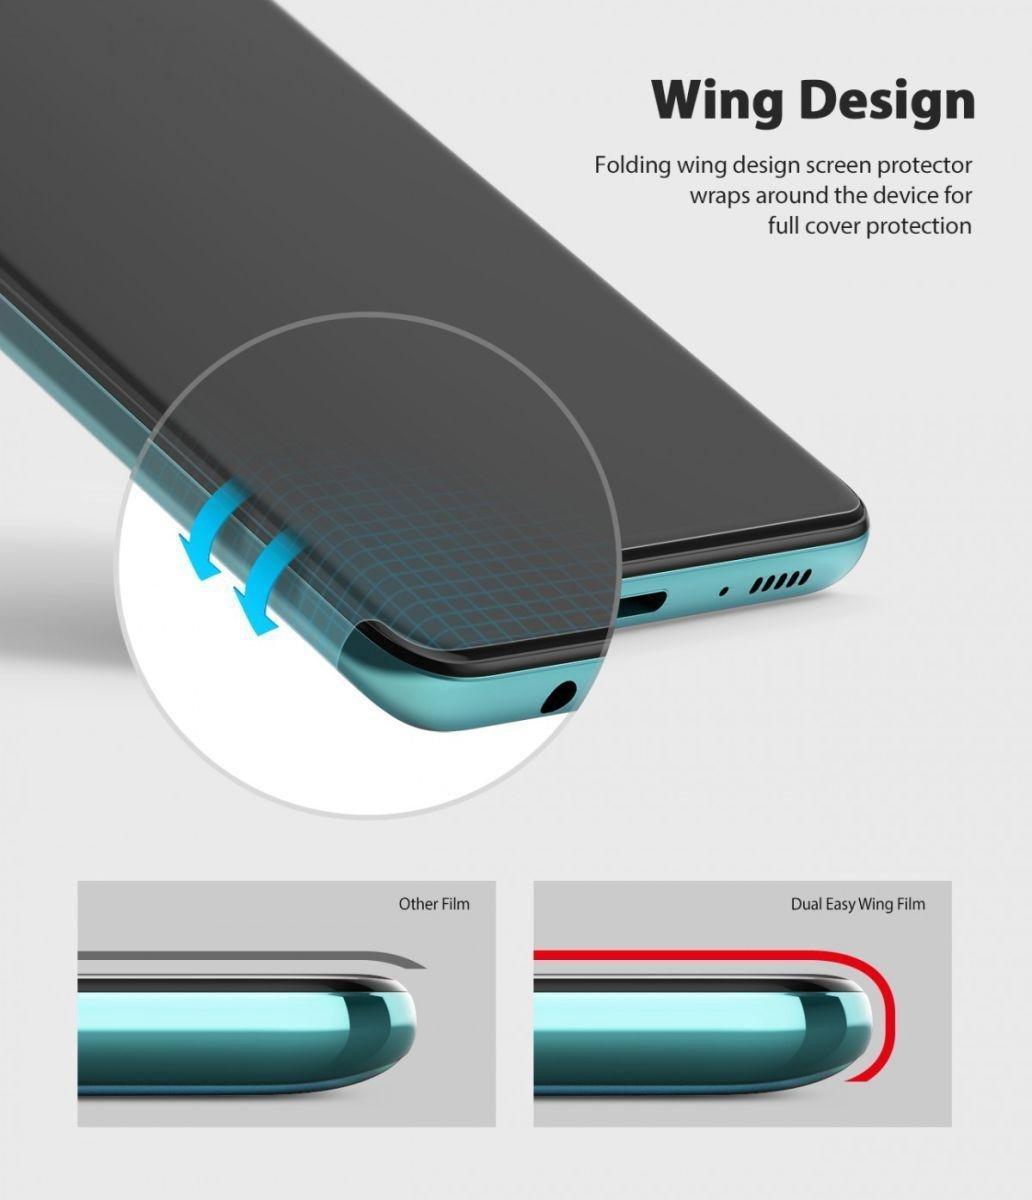 Защитная бронированная пленка Ringke Dual Easy Wing 2x на Самсунг Галакси A51